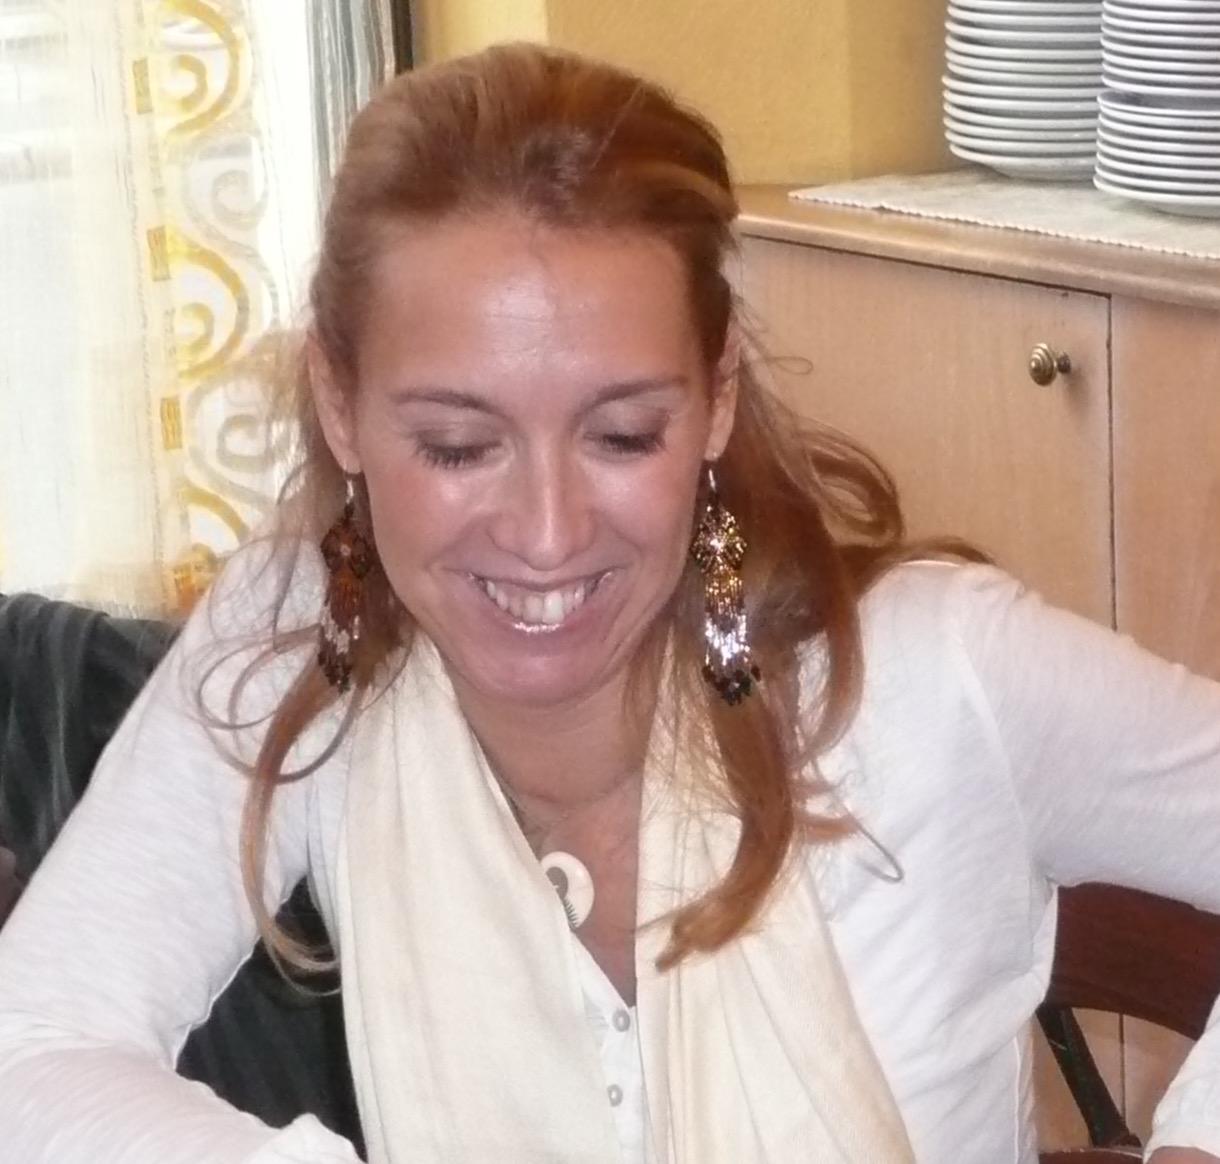 Emanuela Borgnino